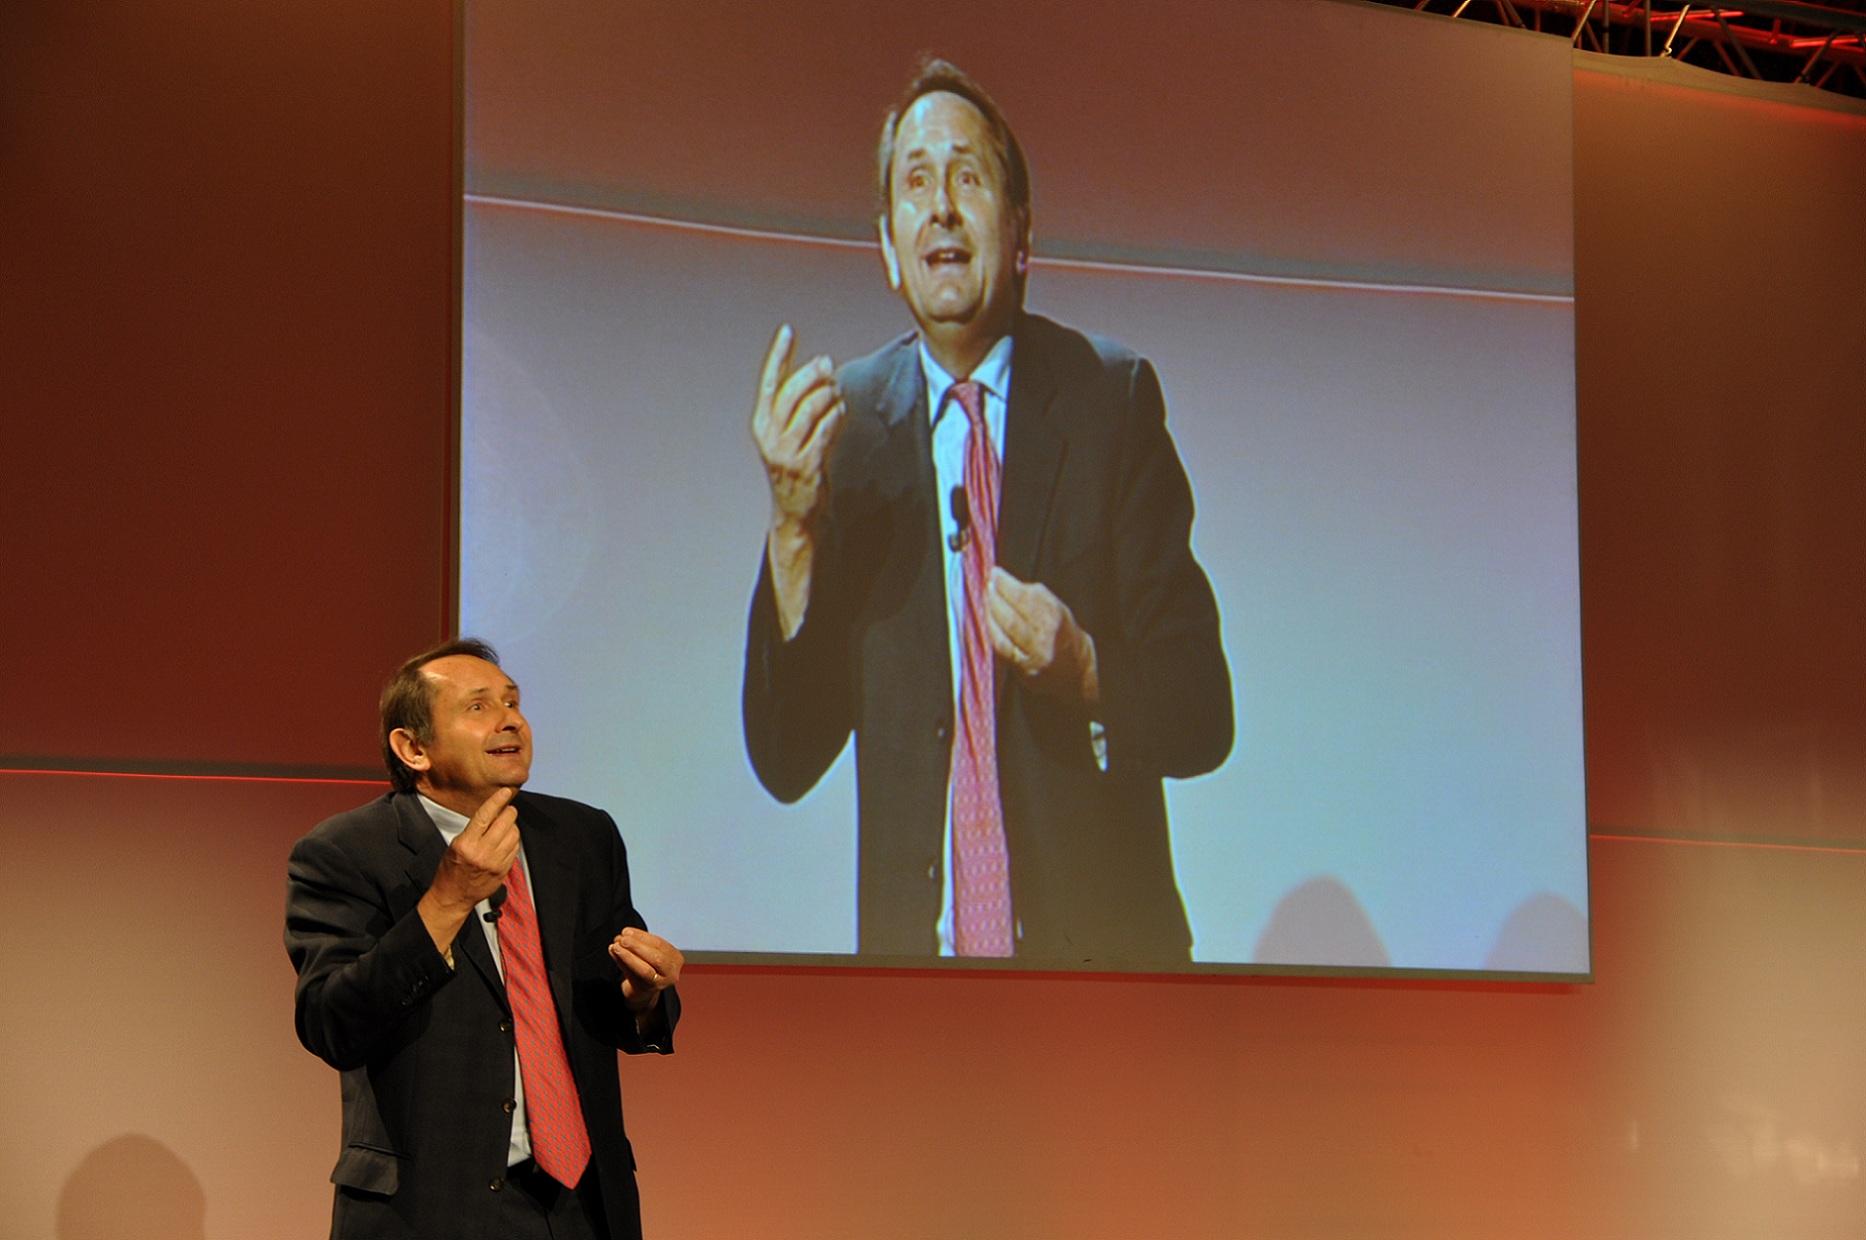 Serge Grudzinski en conférence 4